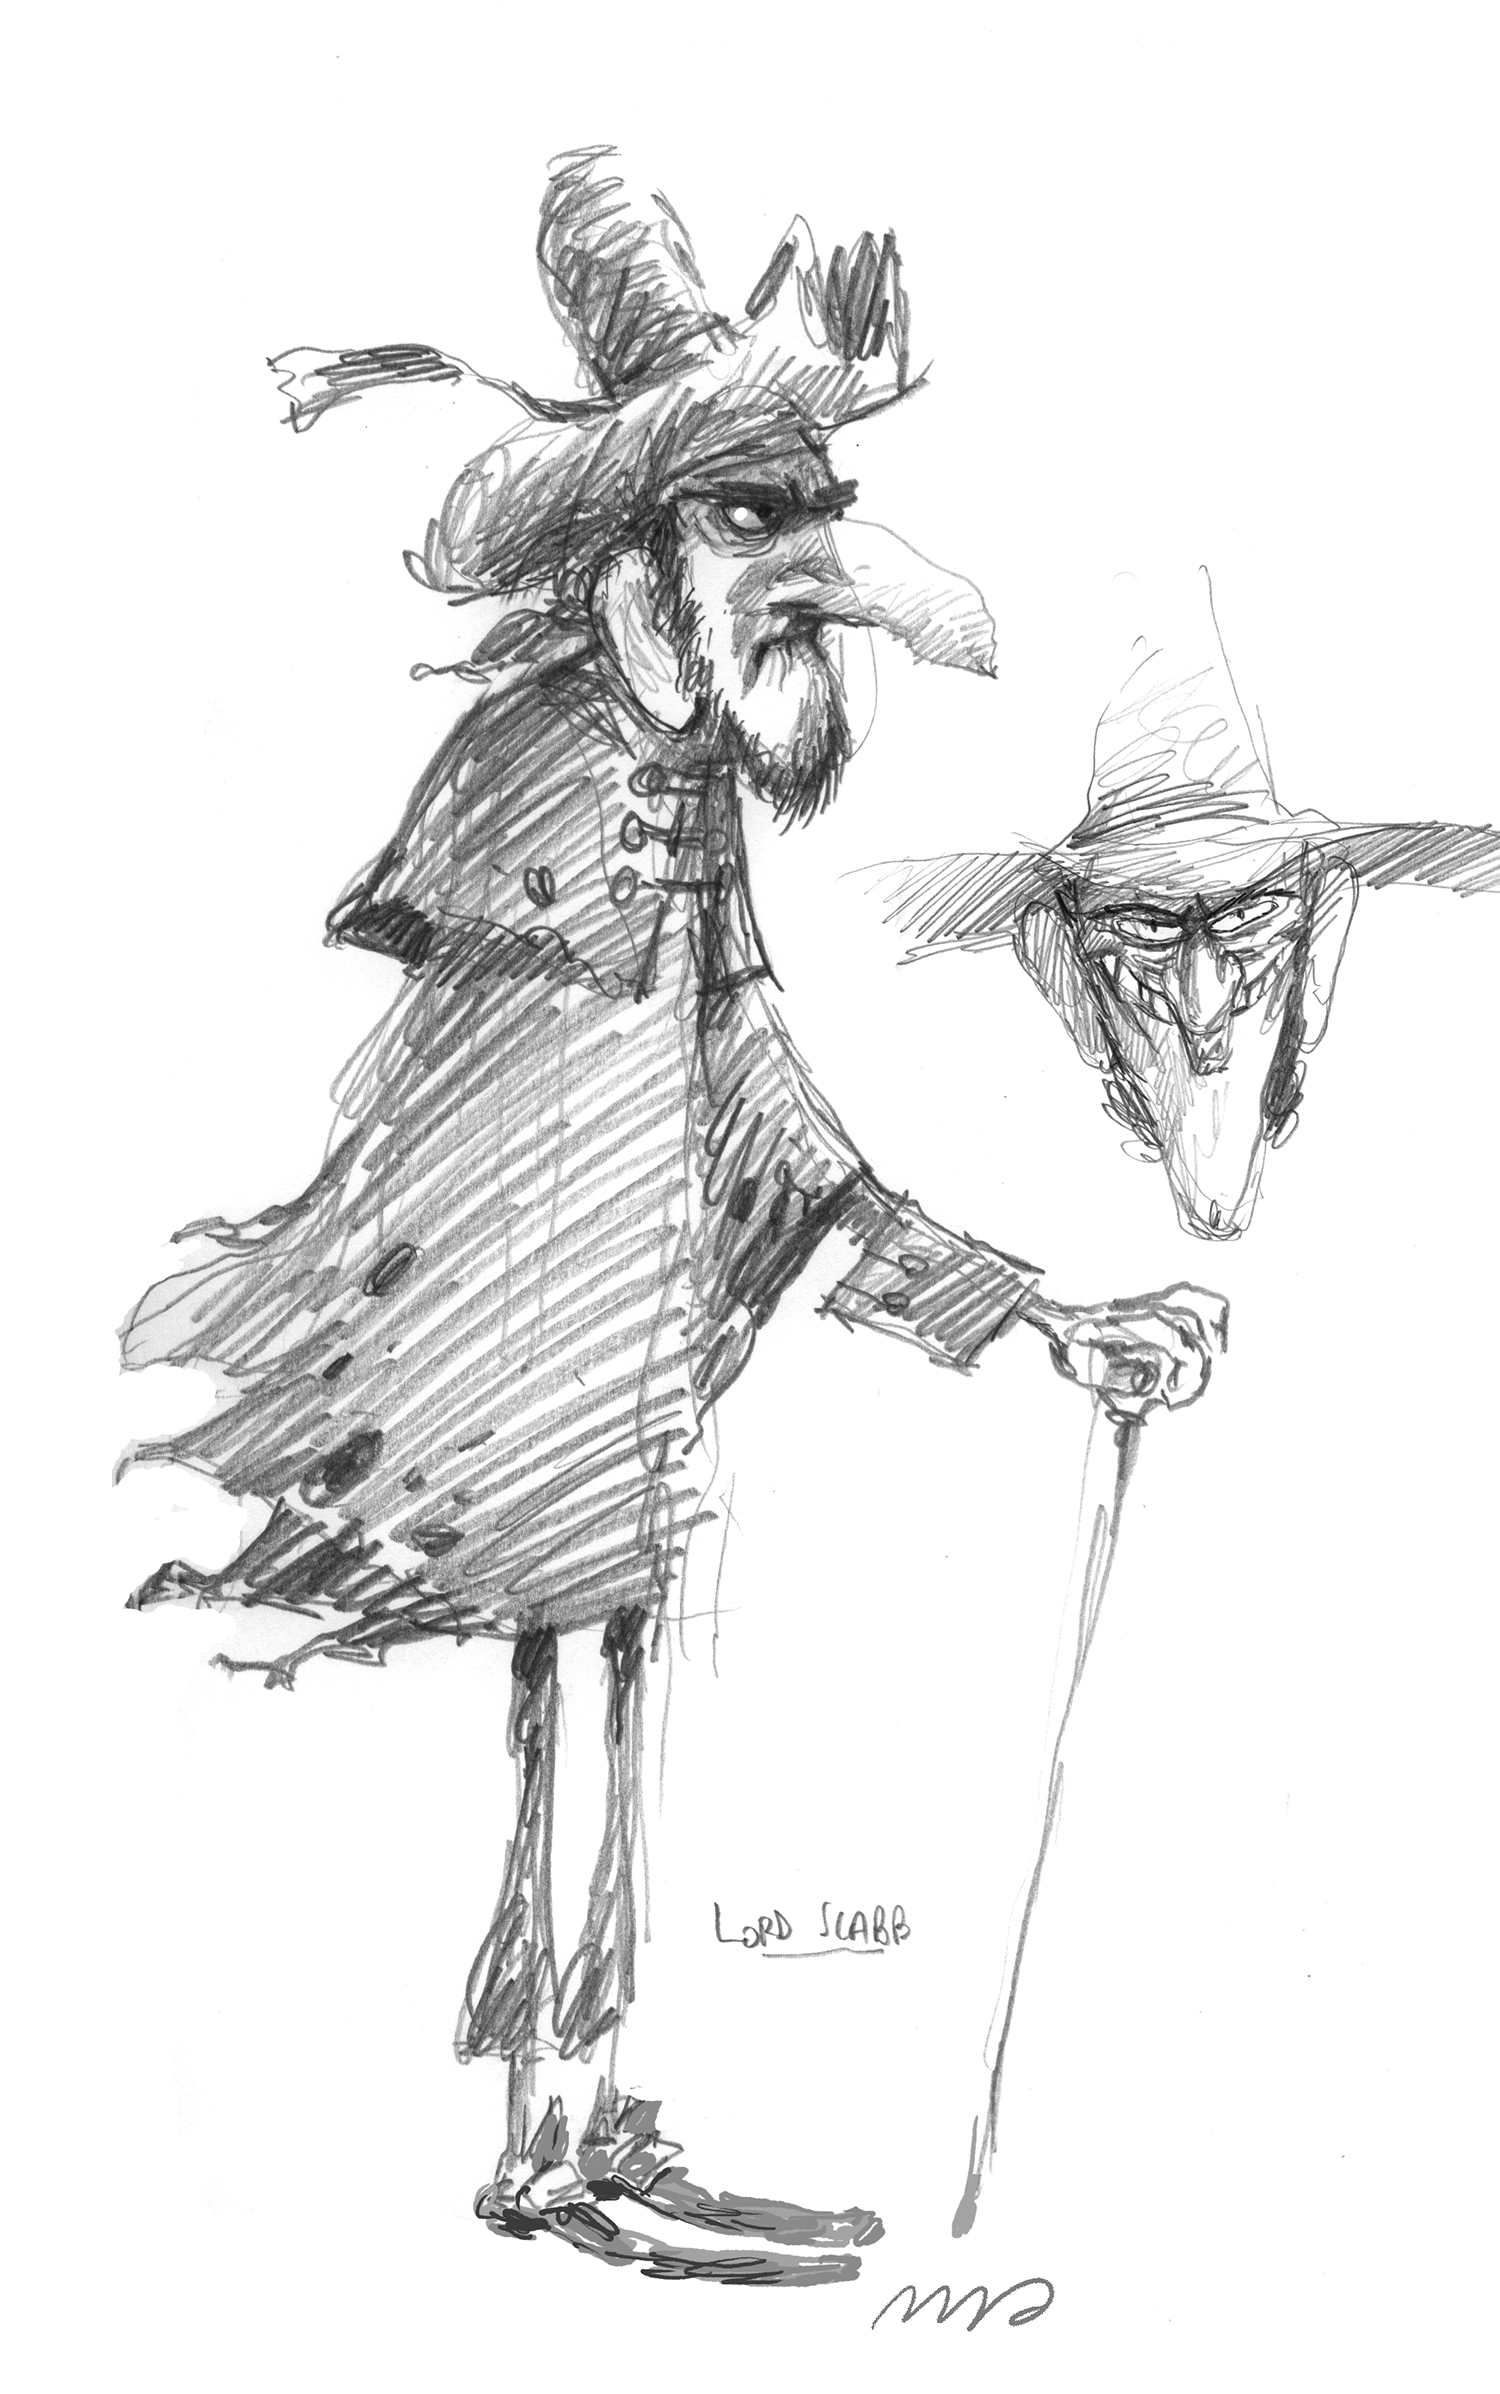 smarc-Verne-LordScabb01.jpg